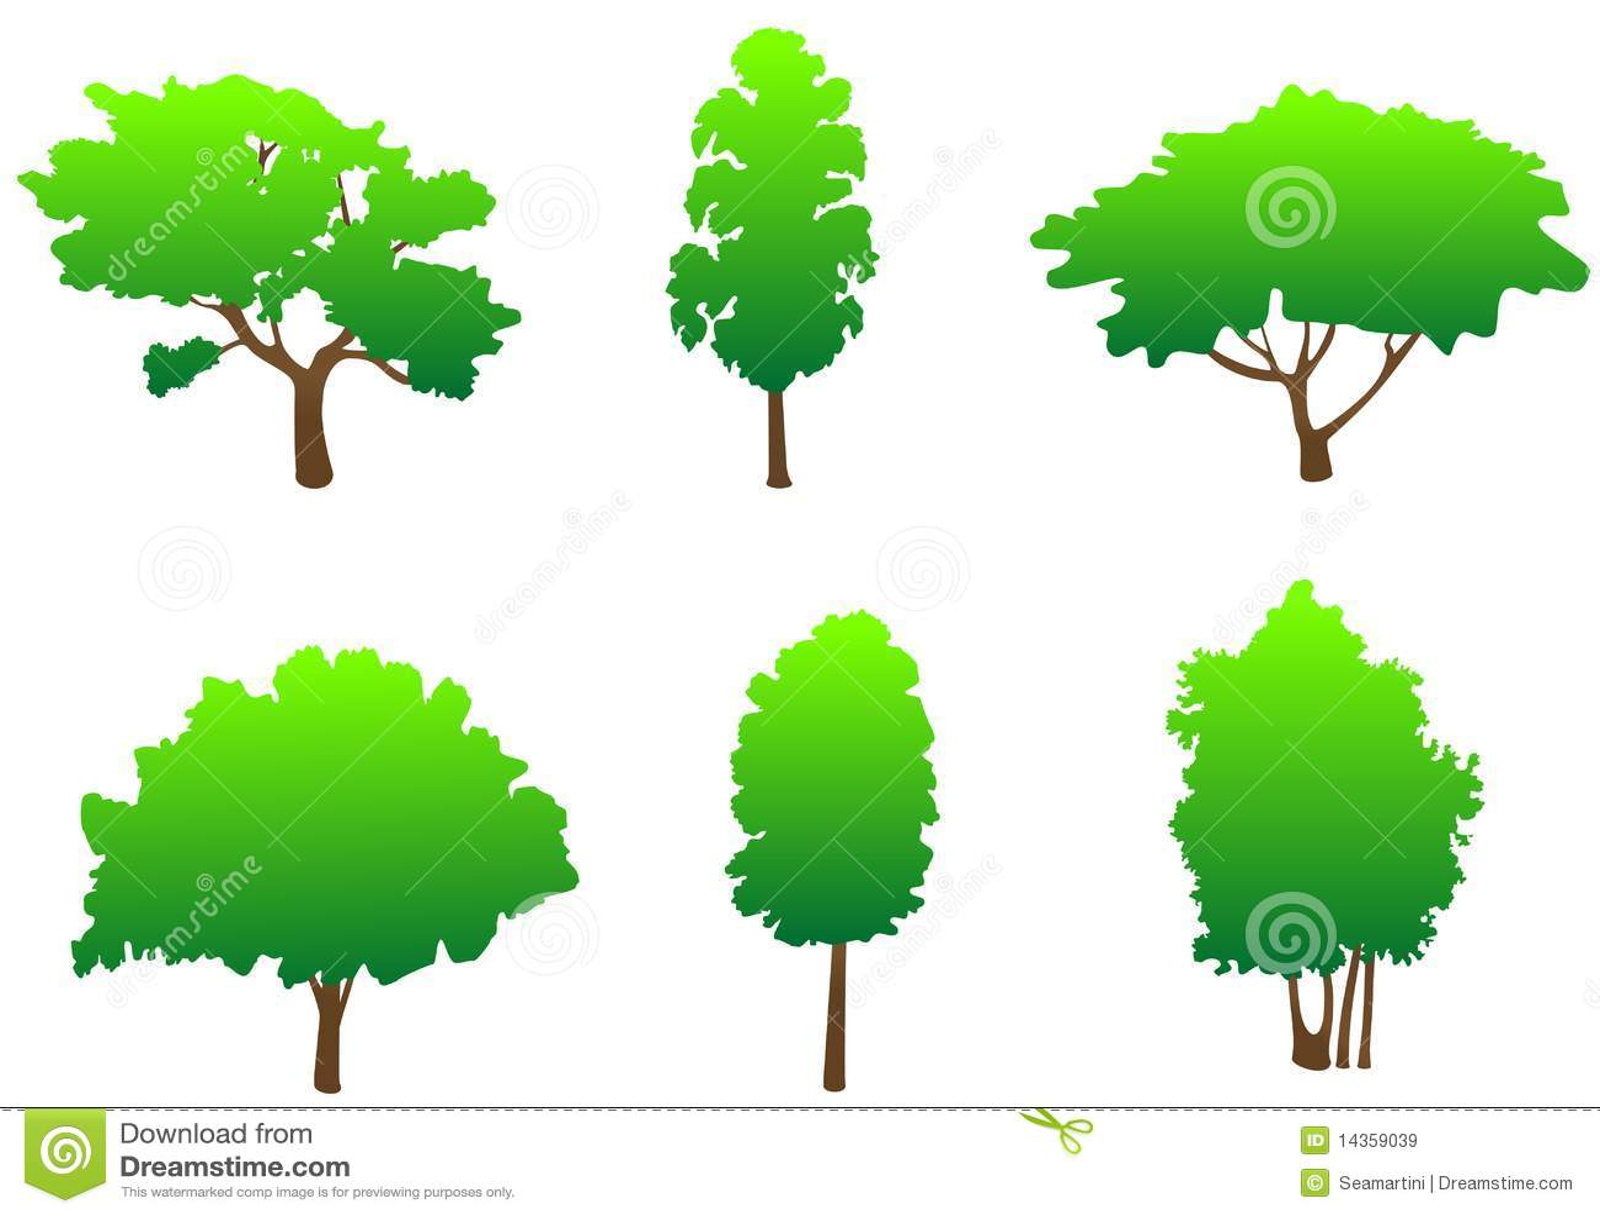 Tree Symbols Royalty Free Stock Images Image 14359039